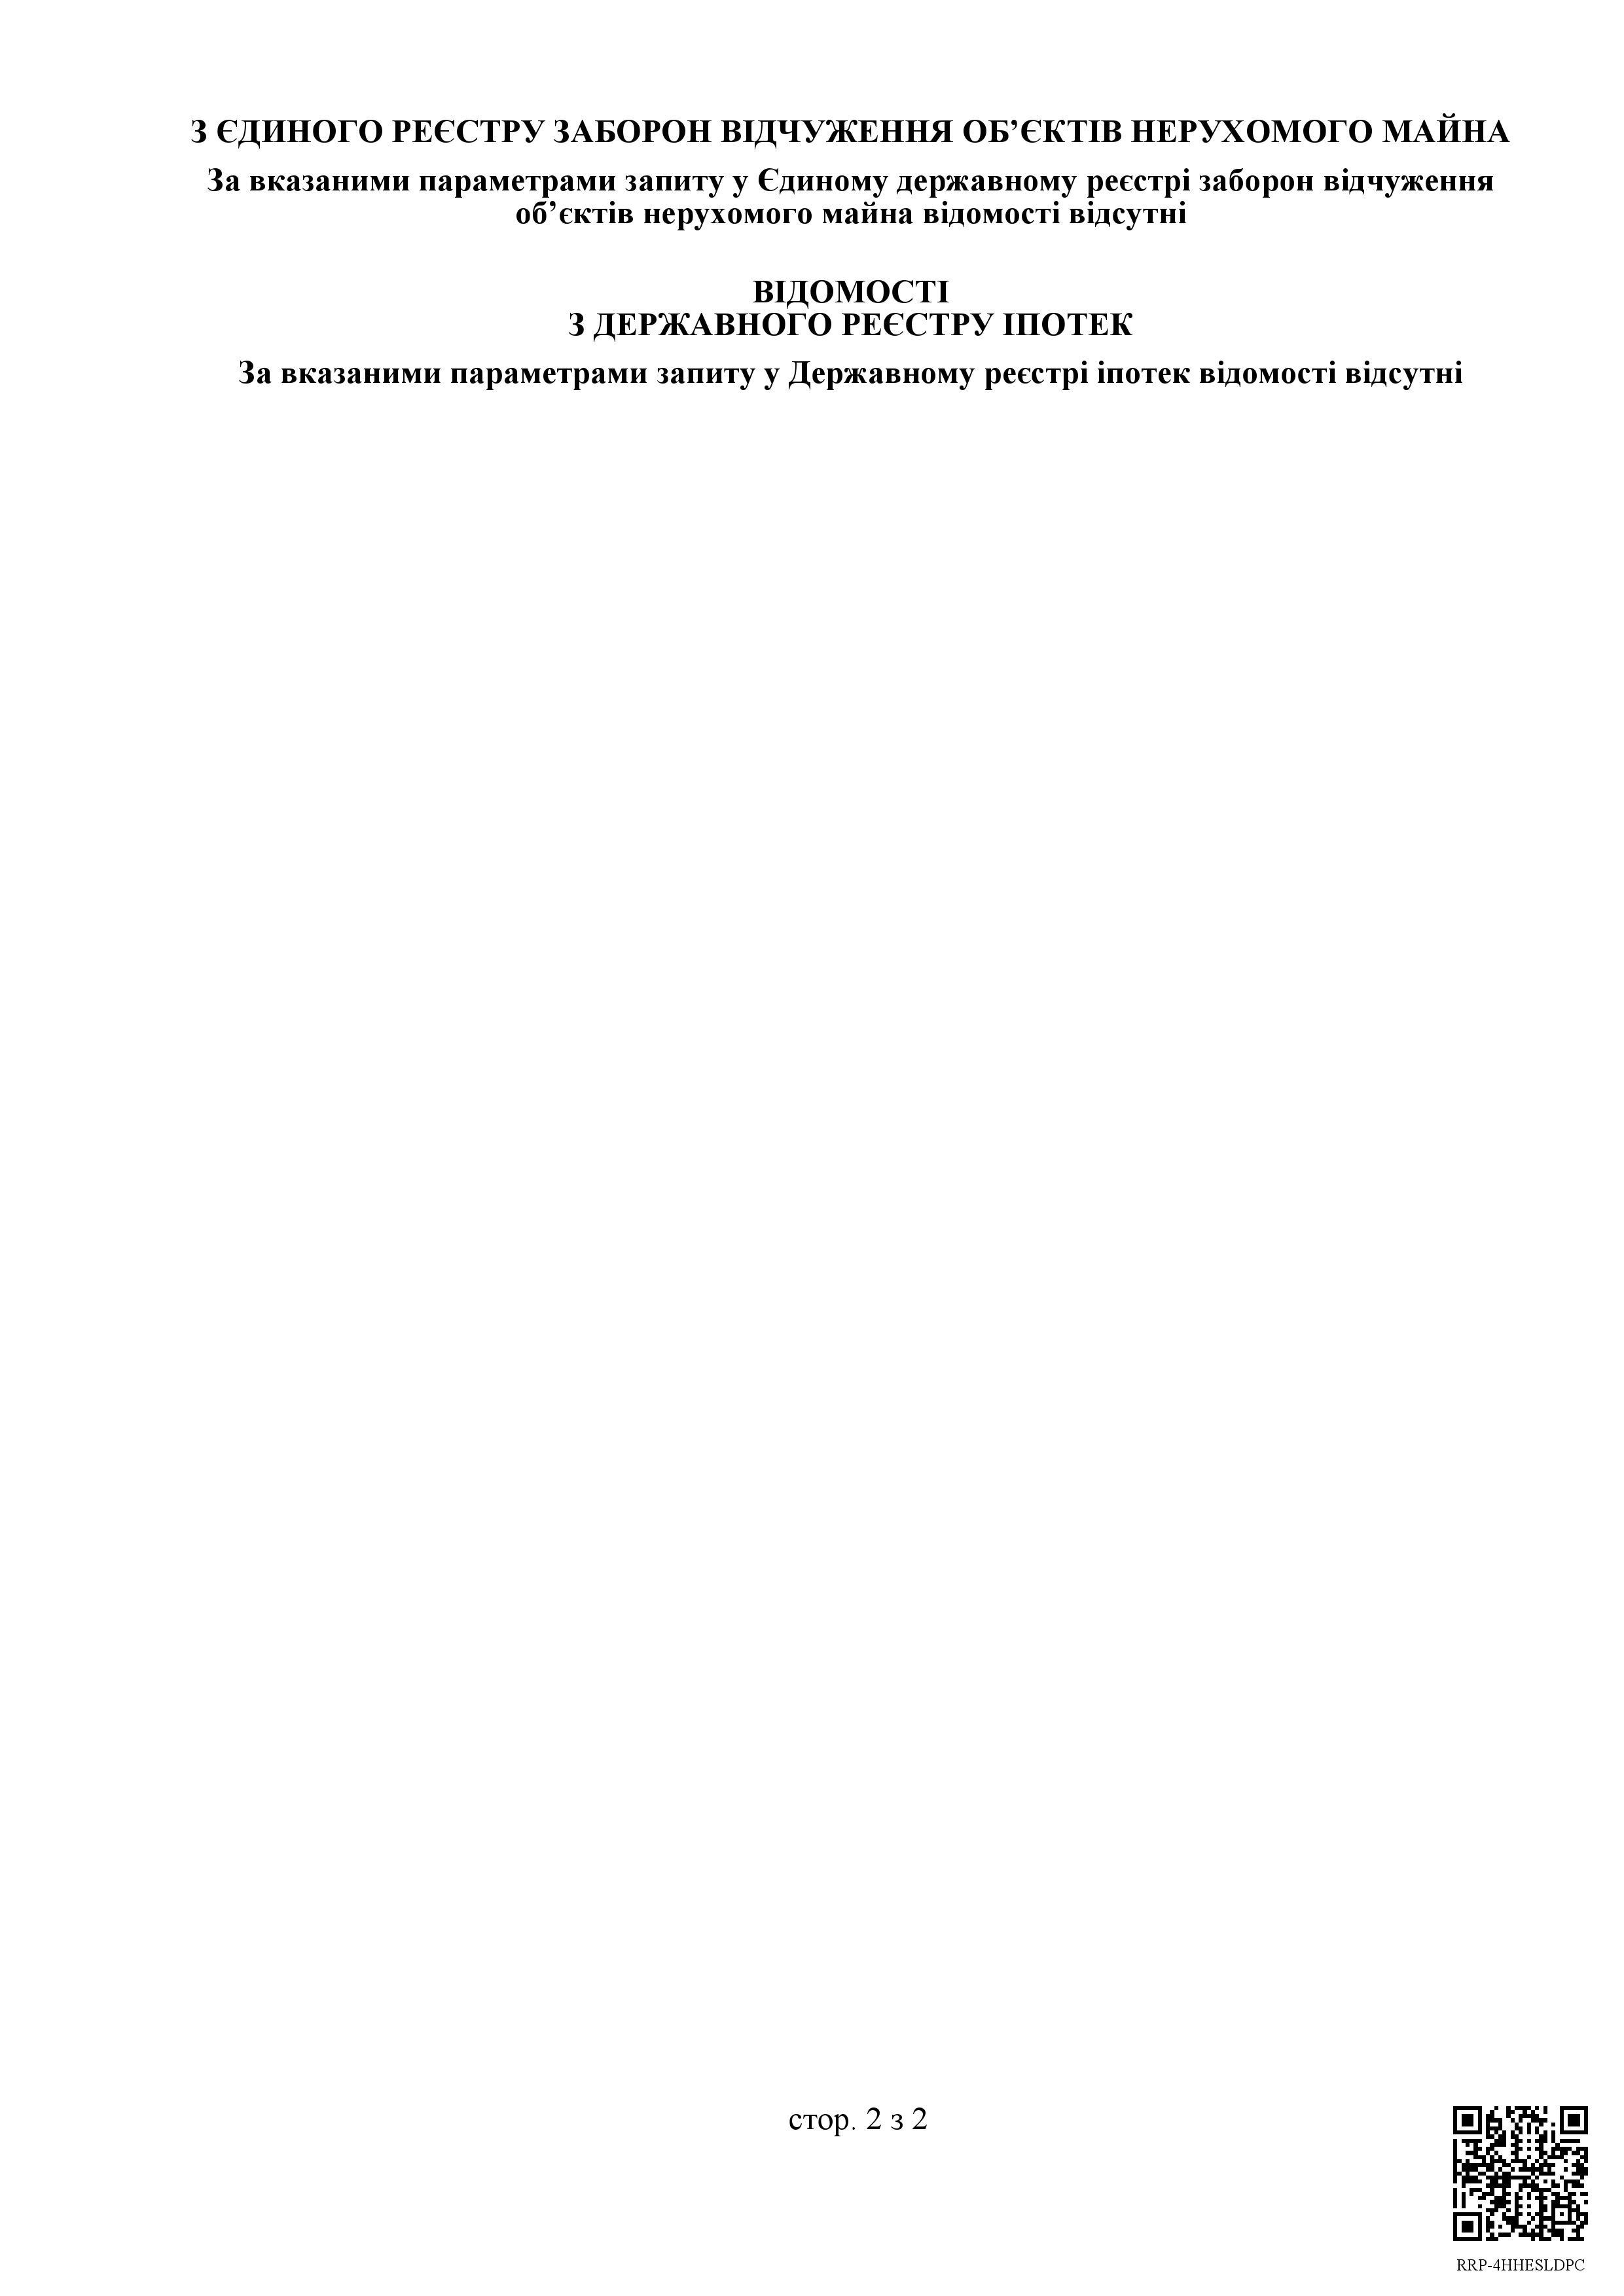 image http://forum.setam.net.ua/assets/images/79-hFcVhekiiHmdrW1q.jpeg